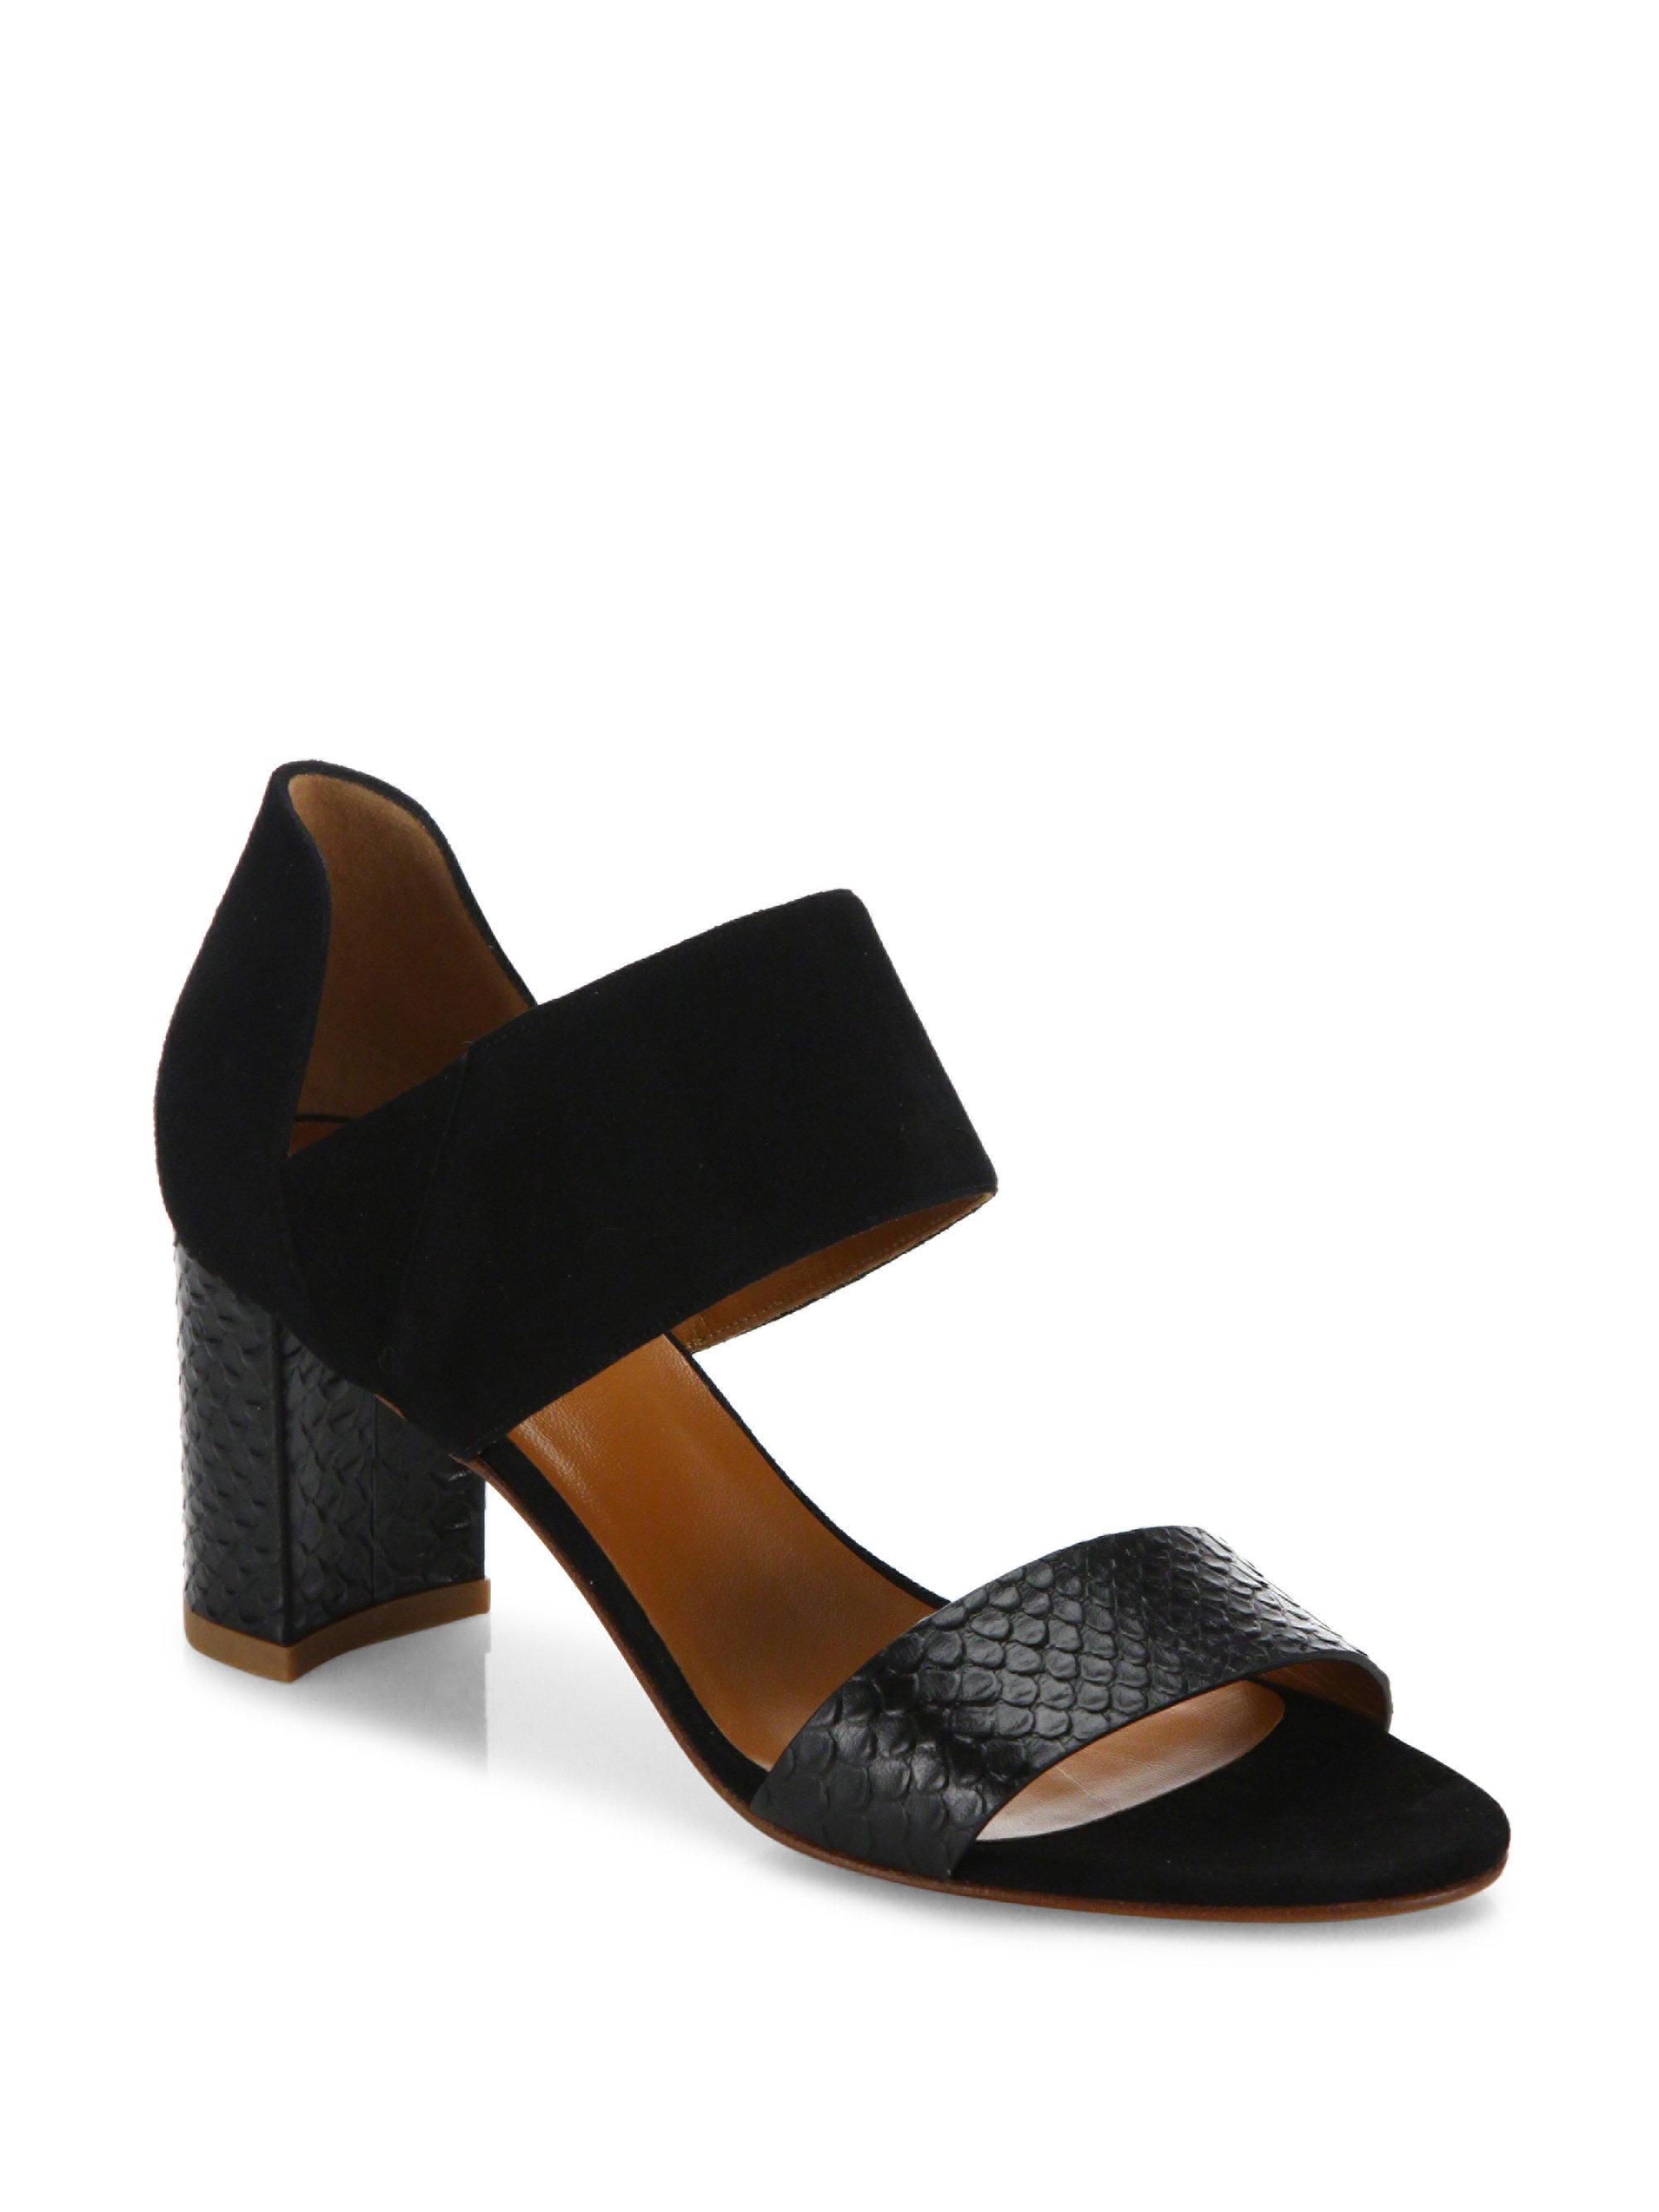 largest supplier sale online Aquatalia Embossed Suzanne Sandals popular sale online xNuN1h